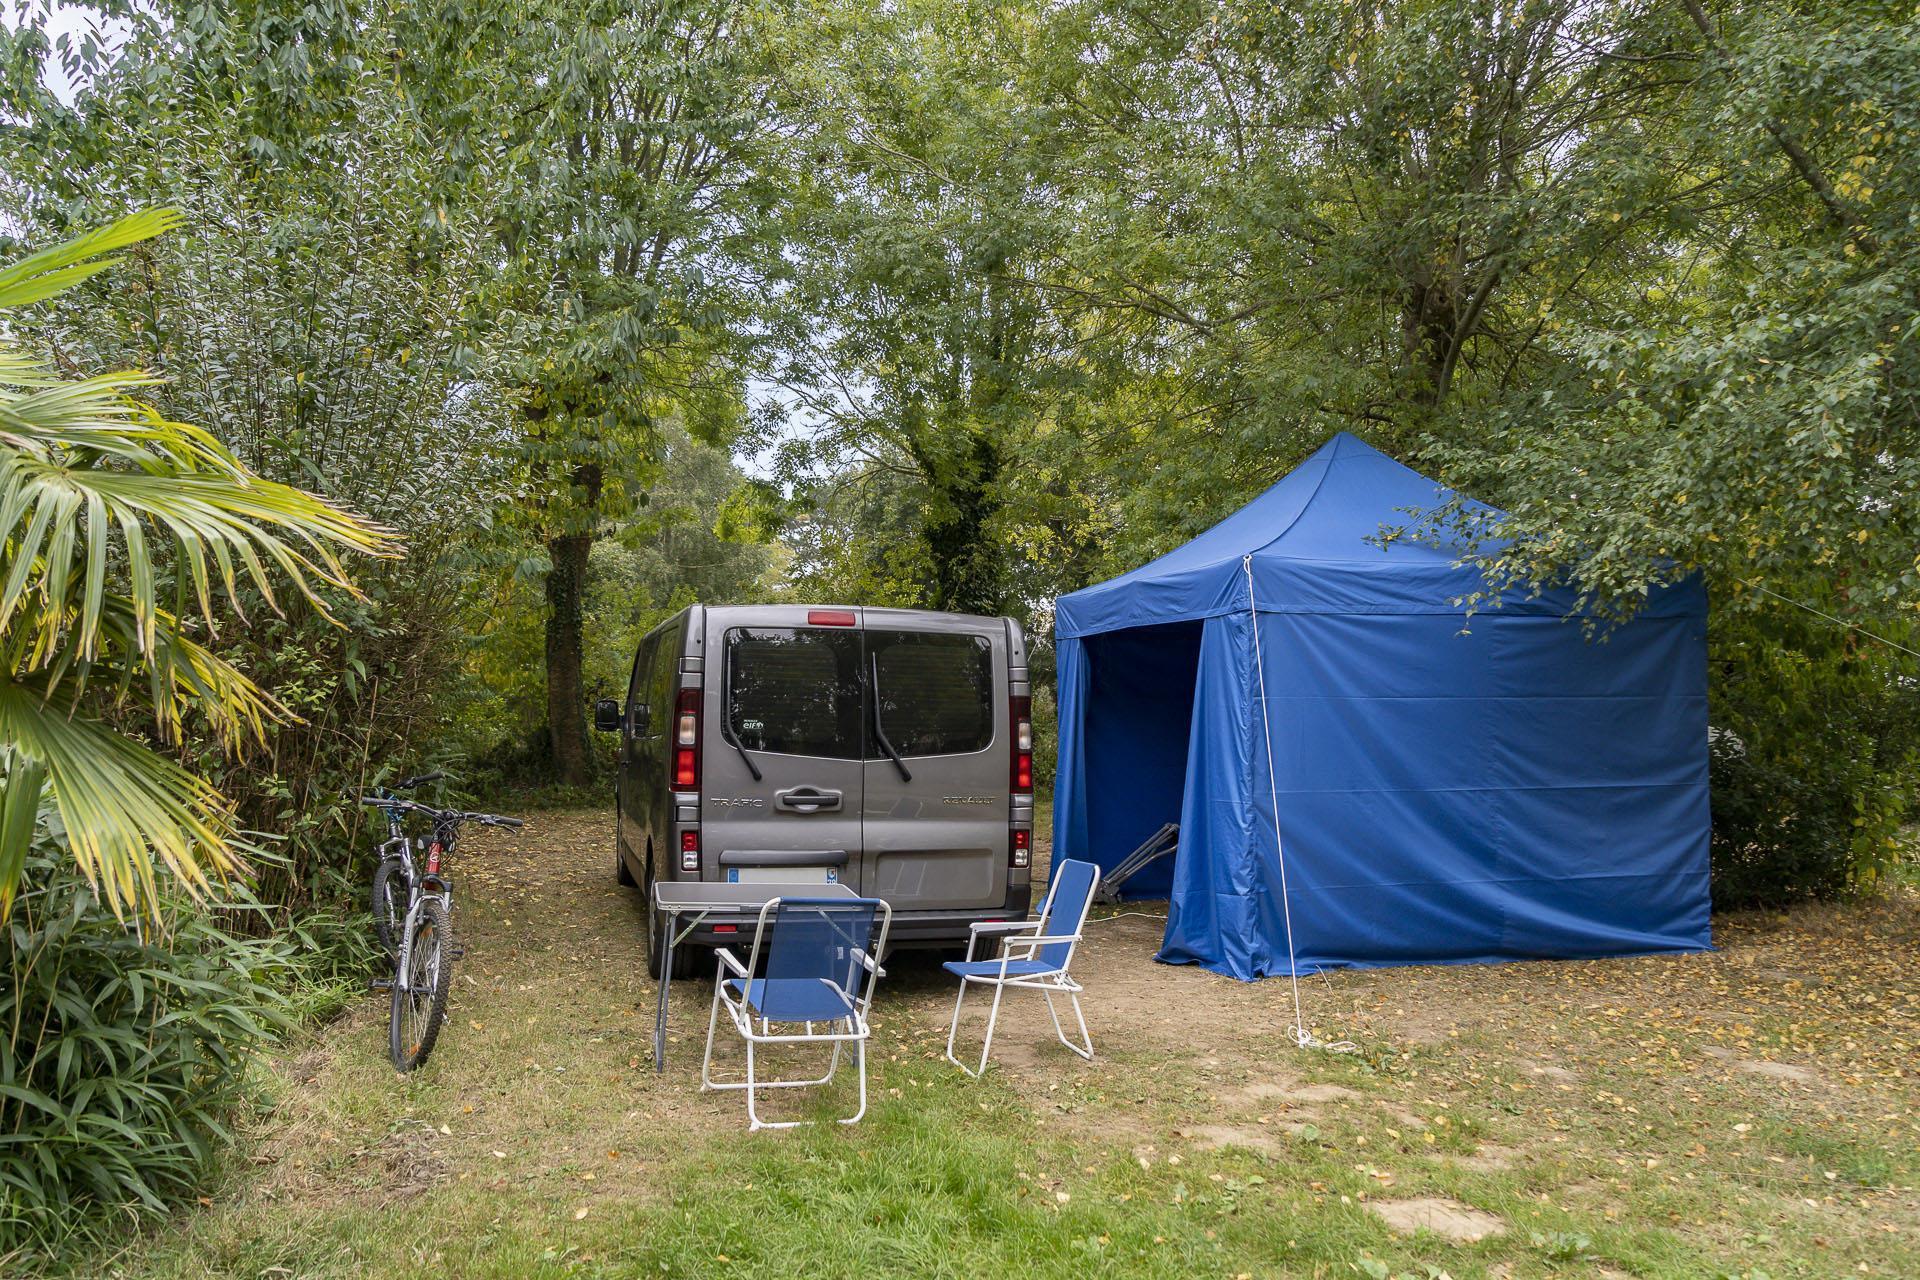 Emplacement - Emplacement **** - Camping Sandaya Les Deux Fontaines